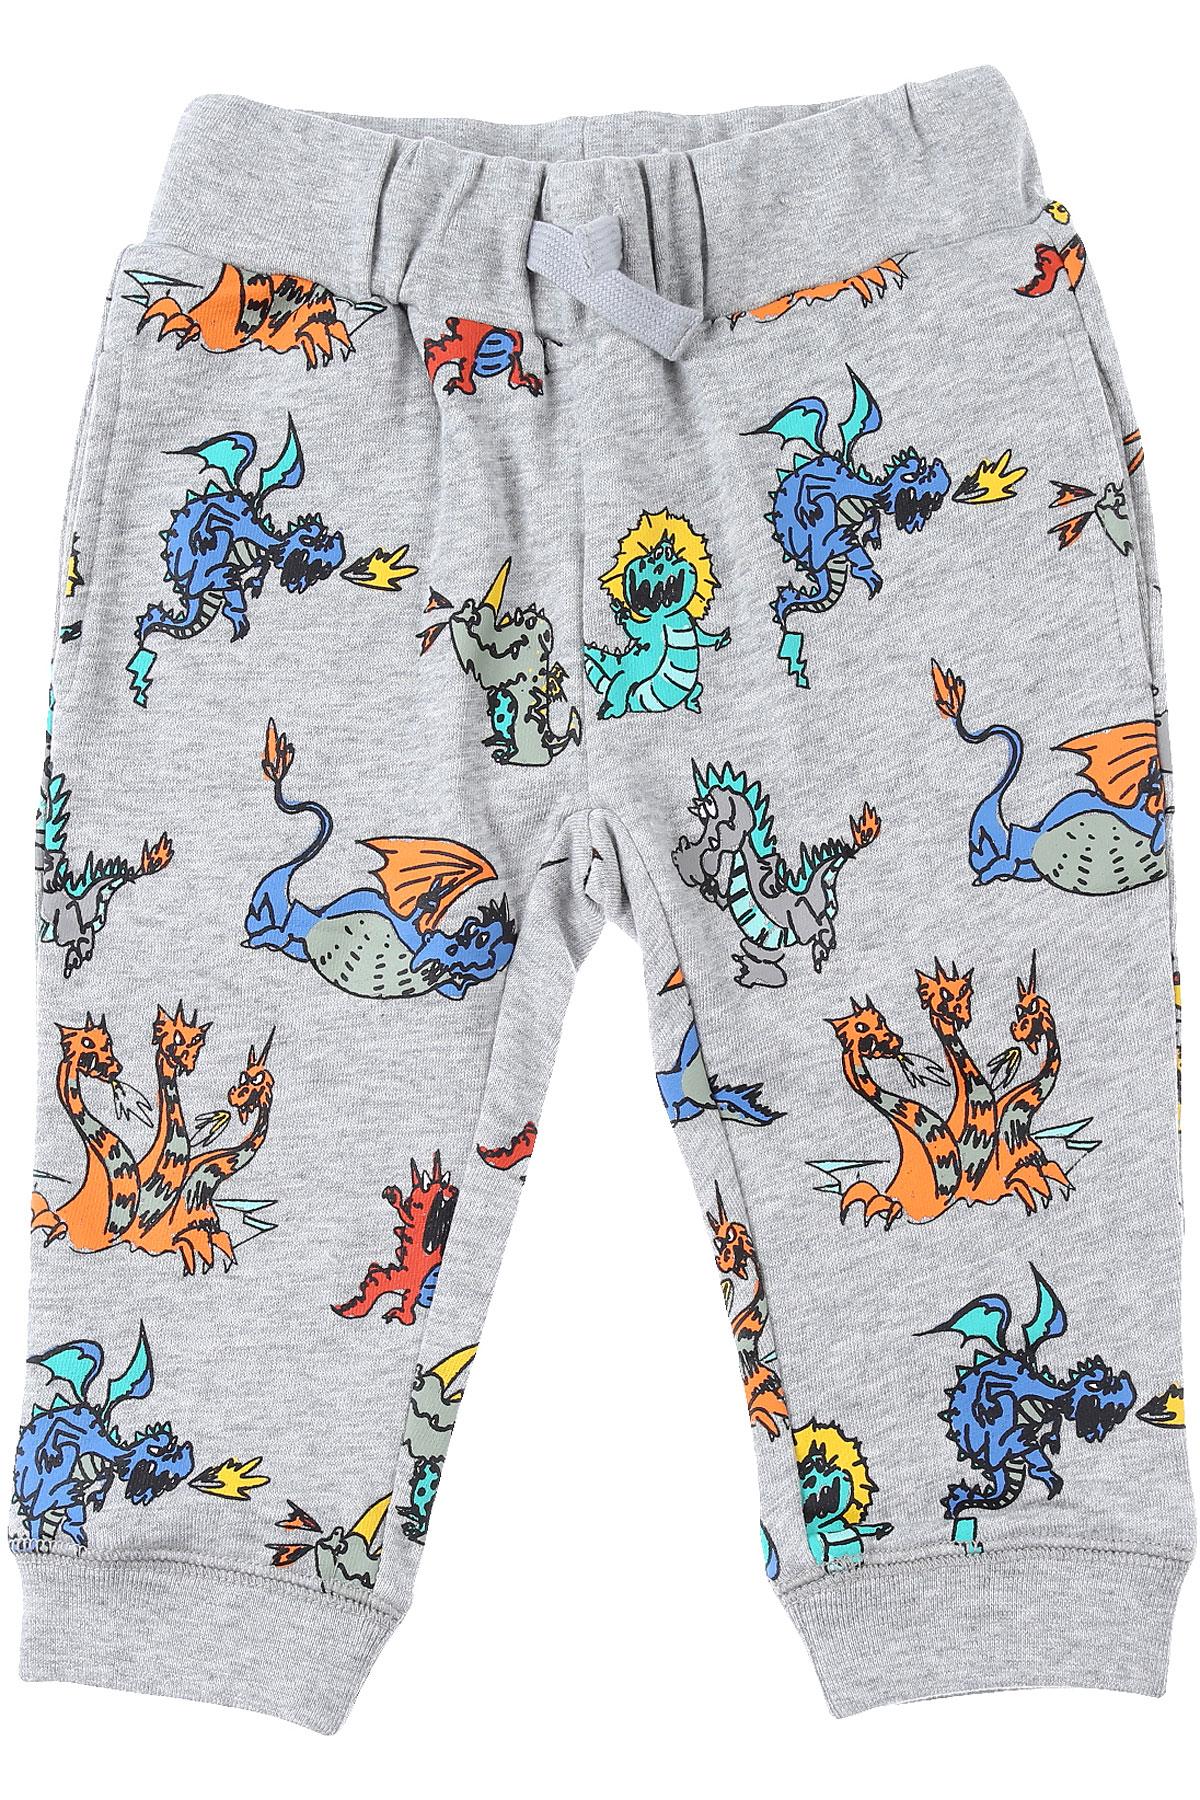 Stella McCartney Baby Sweatpants for Boys On Sale, Grey, Cotton, 2019, 12 M 18 M 2Y 6M 9 M